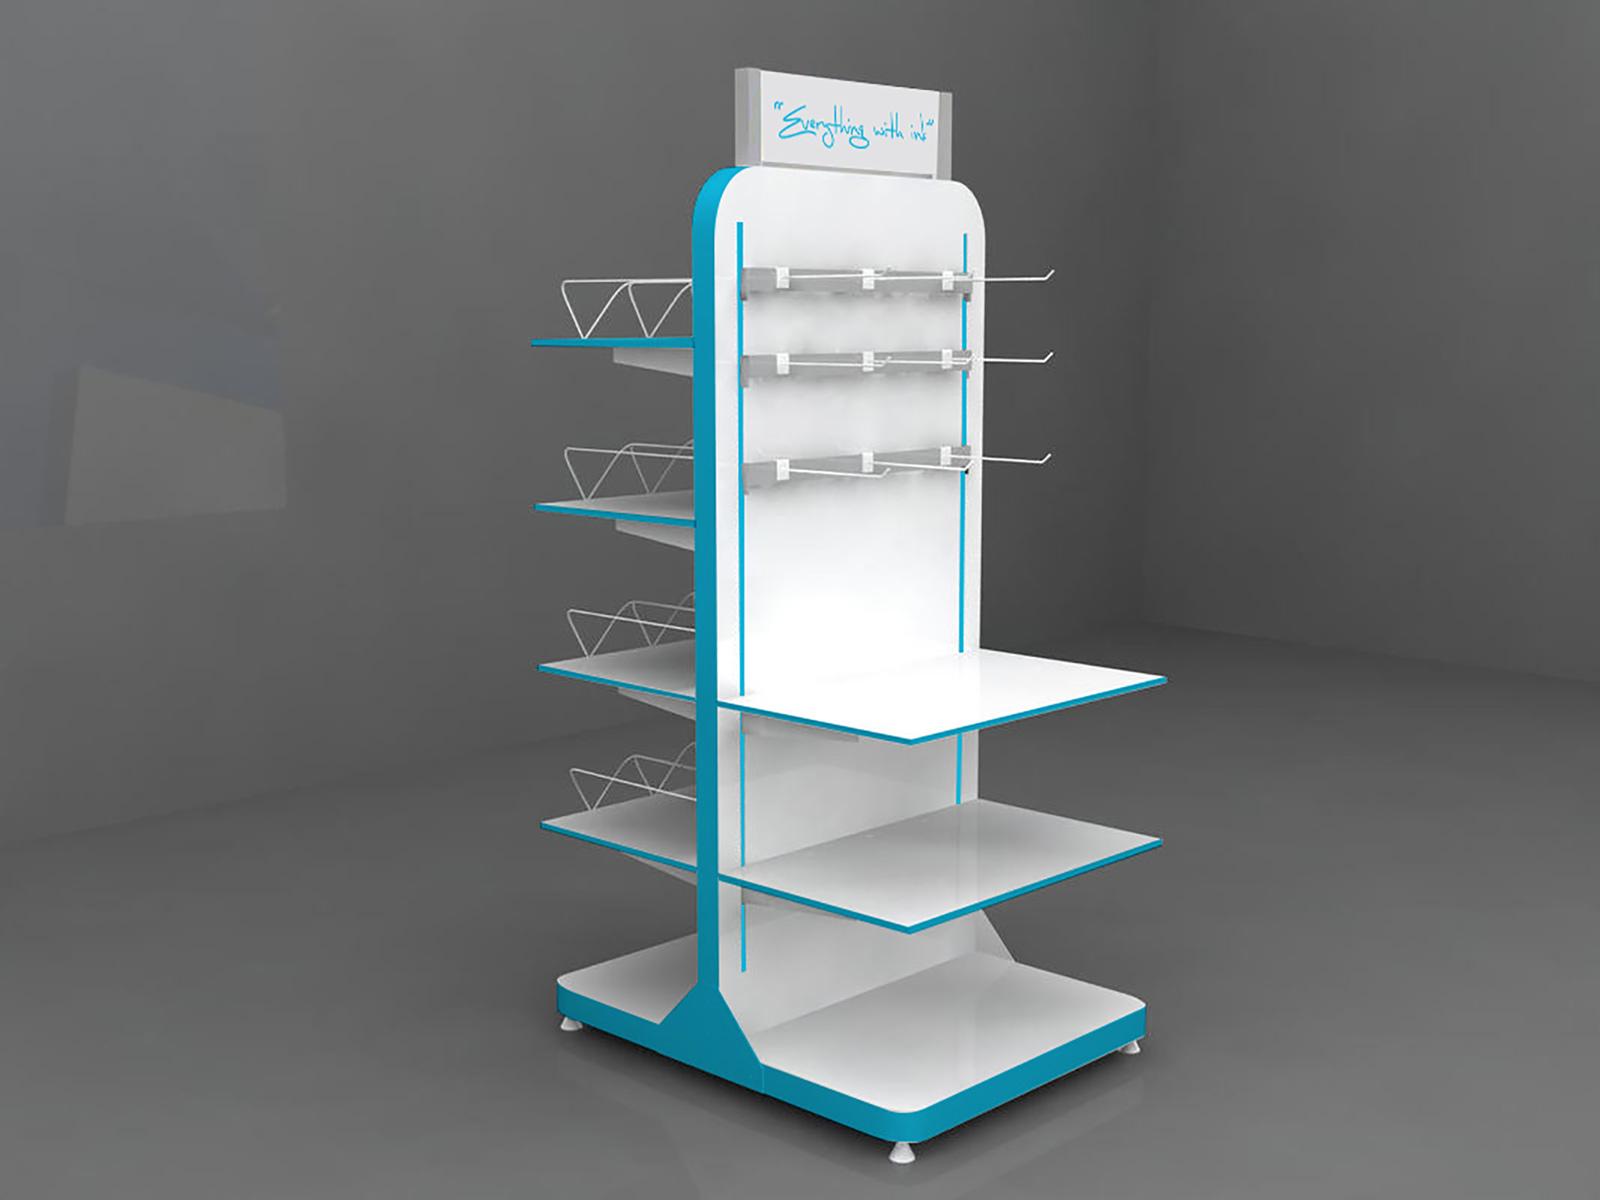 Productstand_02_inkservice-kuwait